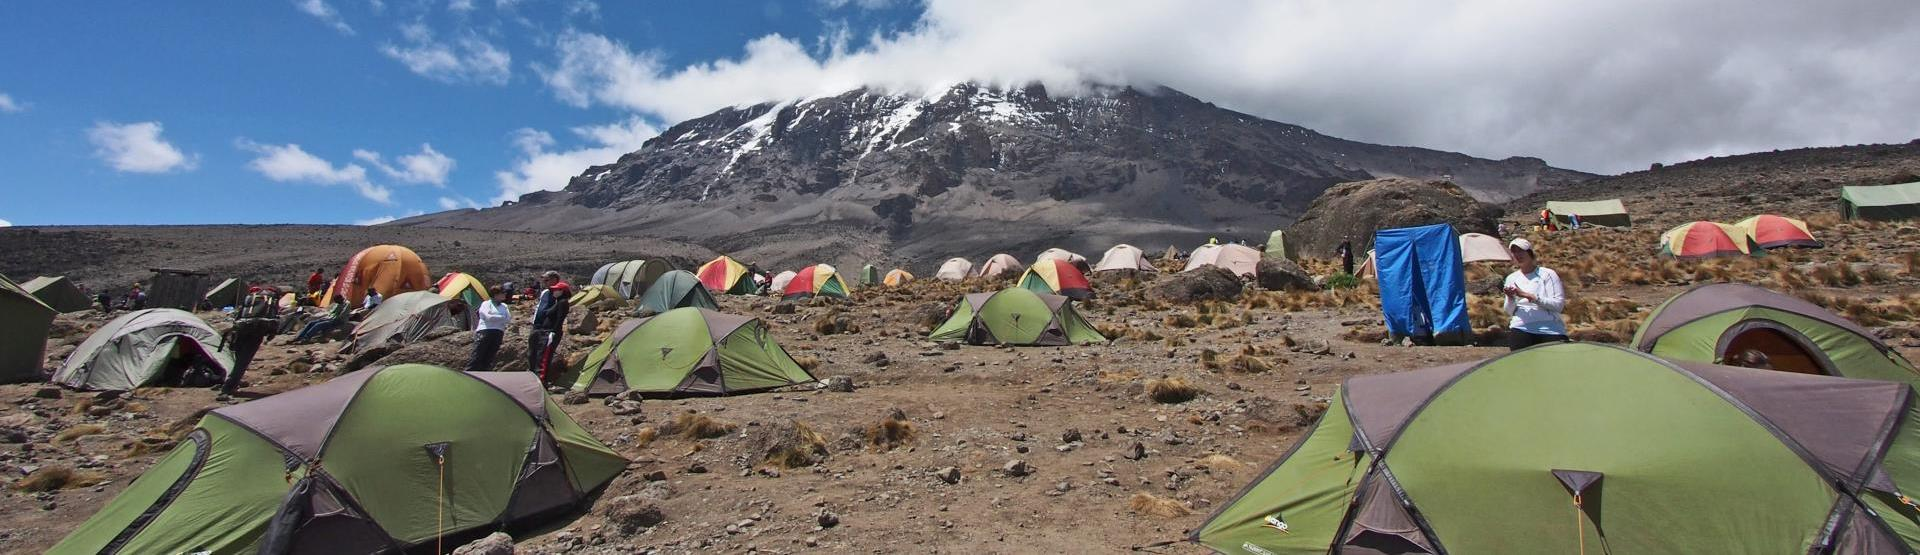 Camping-at-Kilimajaro-lemosho route